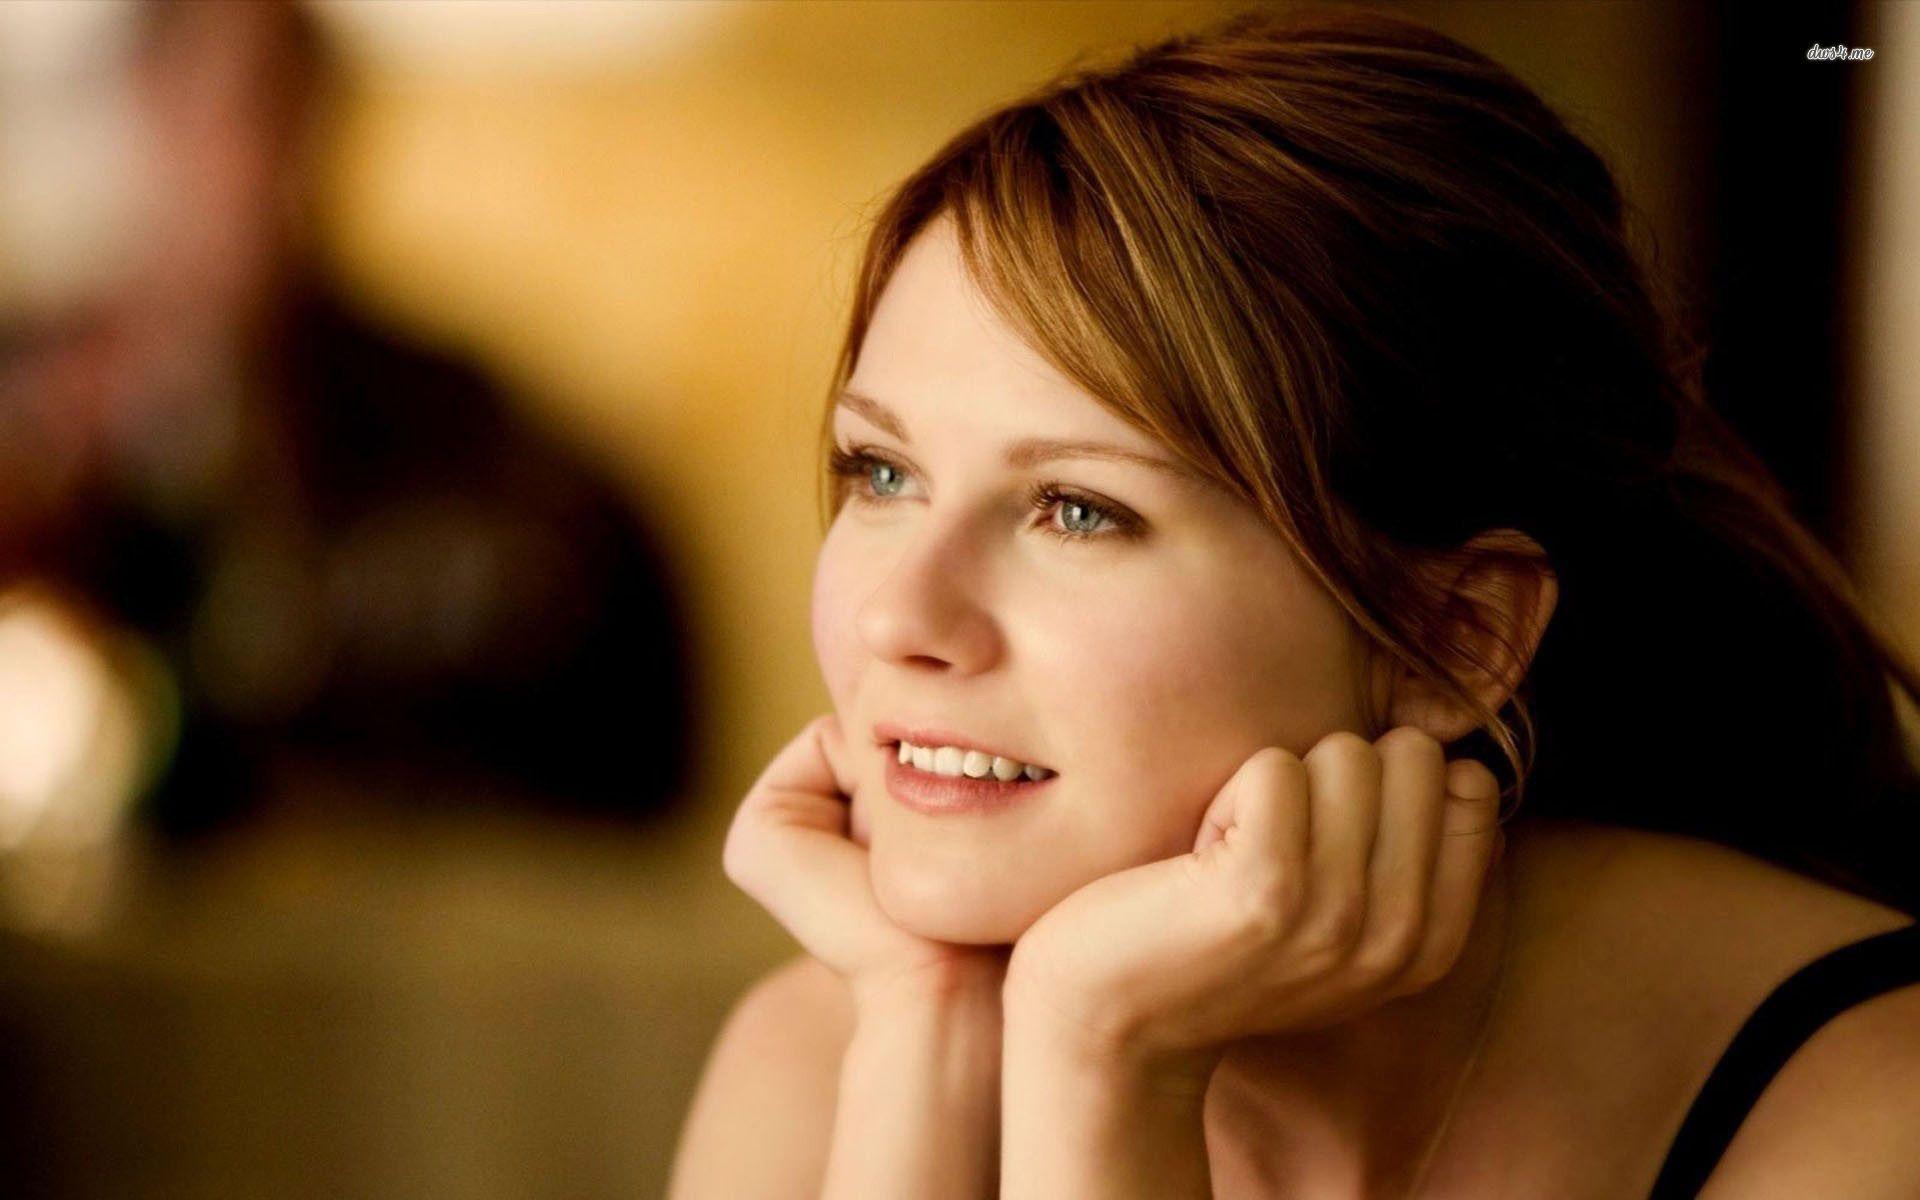 Kirsten Dunst Wallpapers, Photos &amp- Images in HD